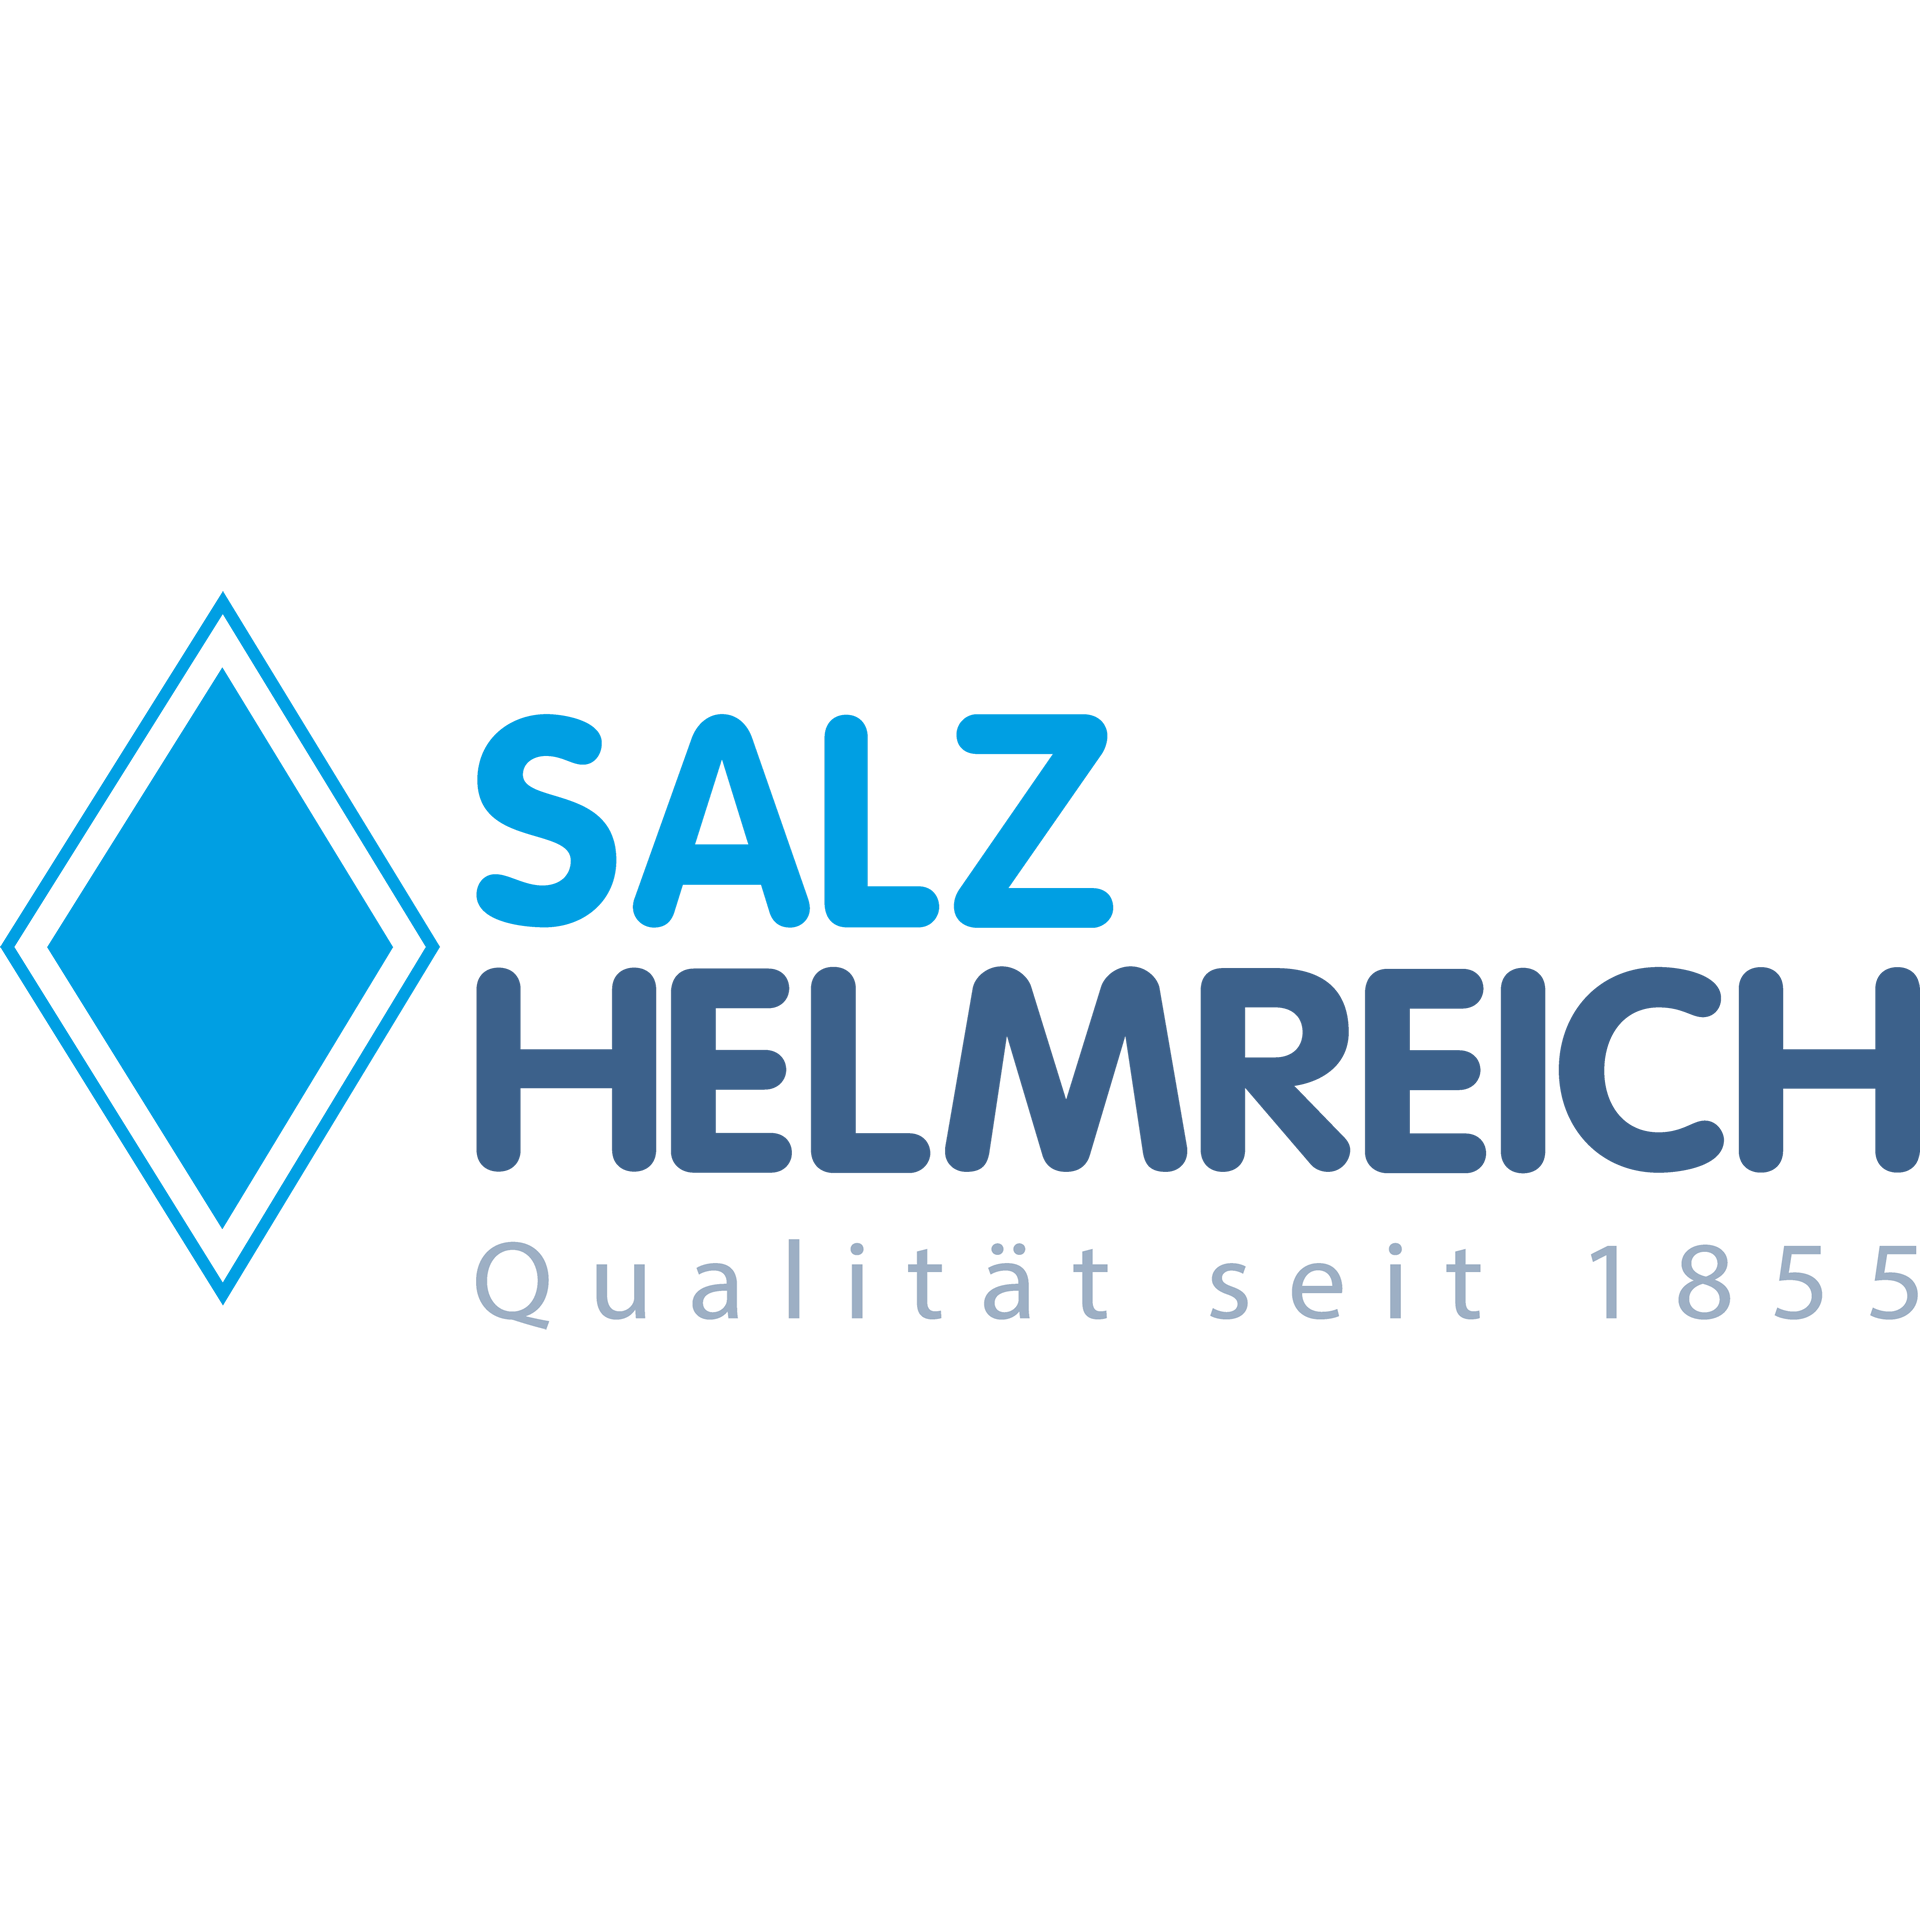 RÄUCHERGOLD KL 2-16 Buchenholzspäne - original im 15 kg Sack